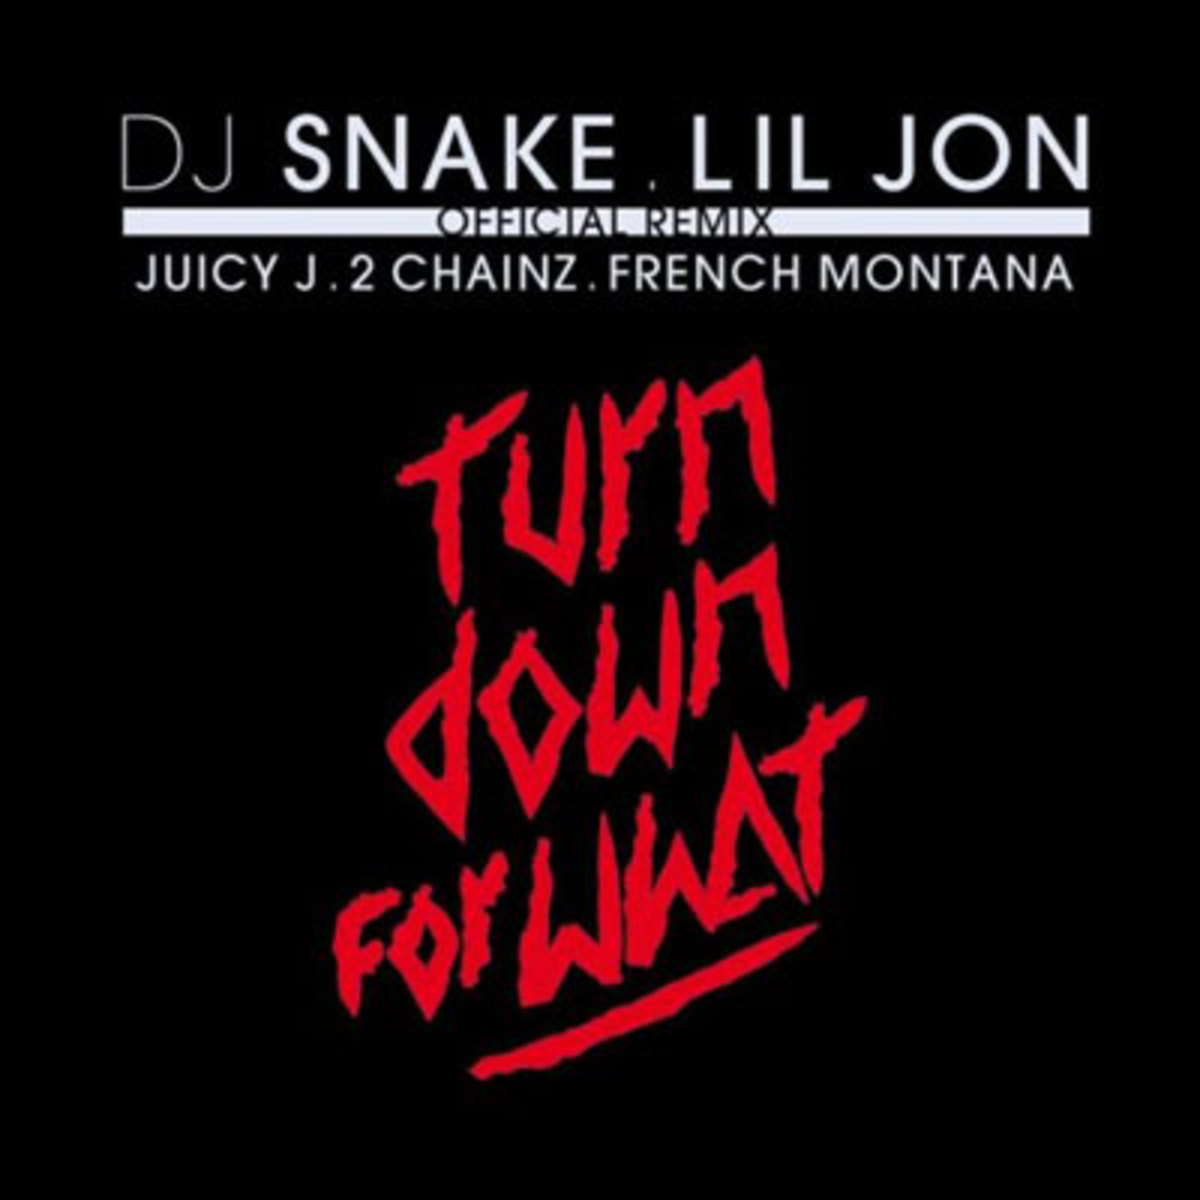 Dj snake & lil jon turn down for what [music video].